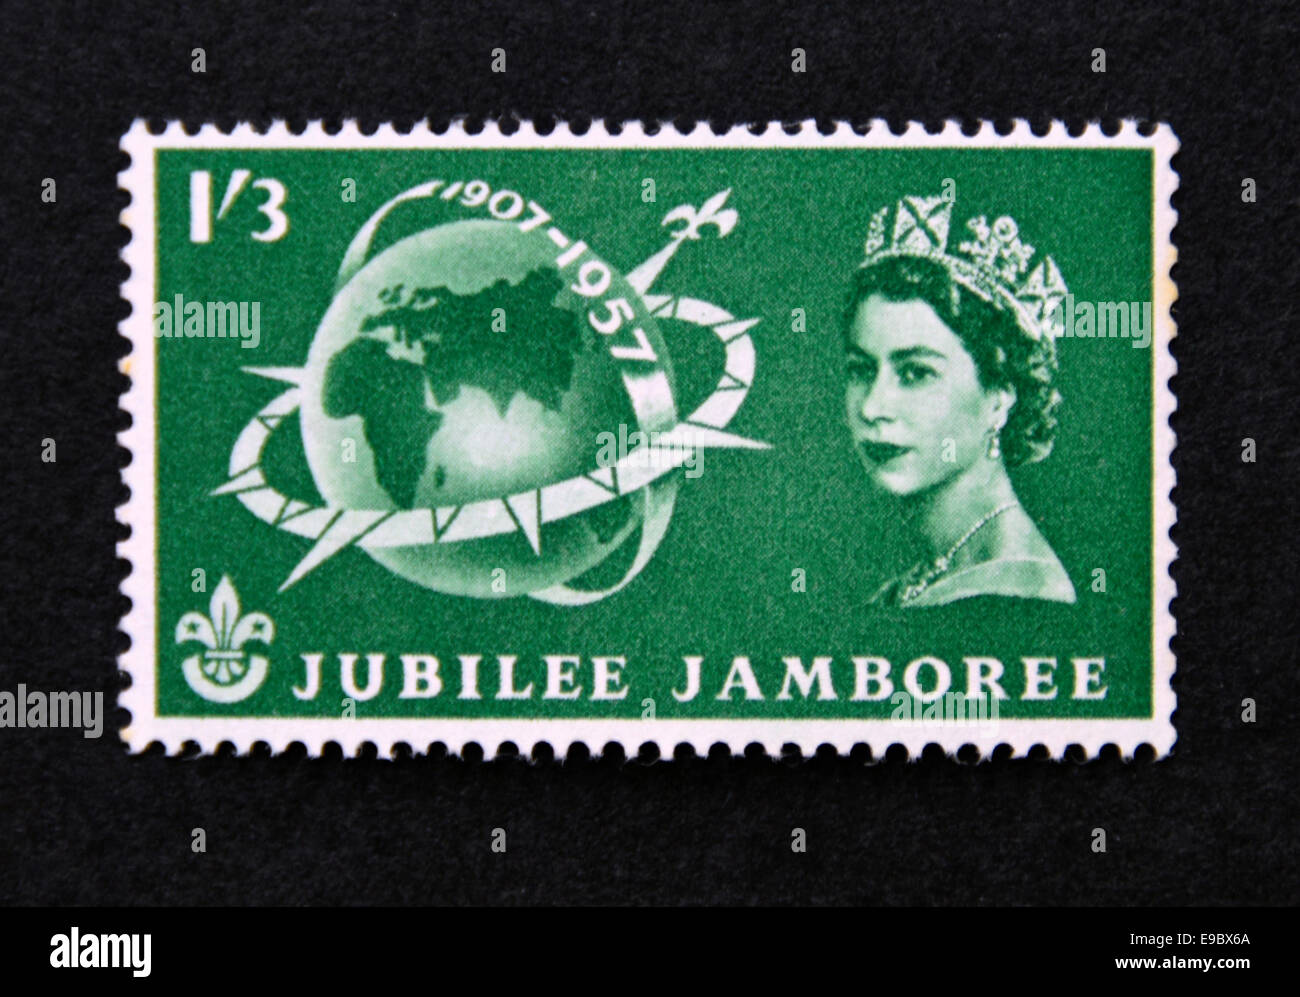 Postage stamp. Great Britain. Queen Elizabeth II. World Scout Jubillee Jamboree. 1957. - Stock Image